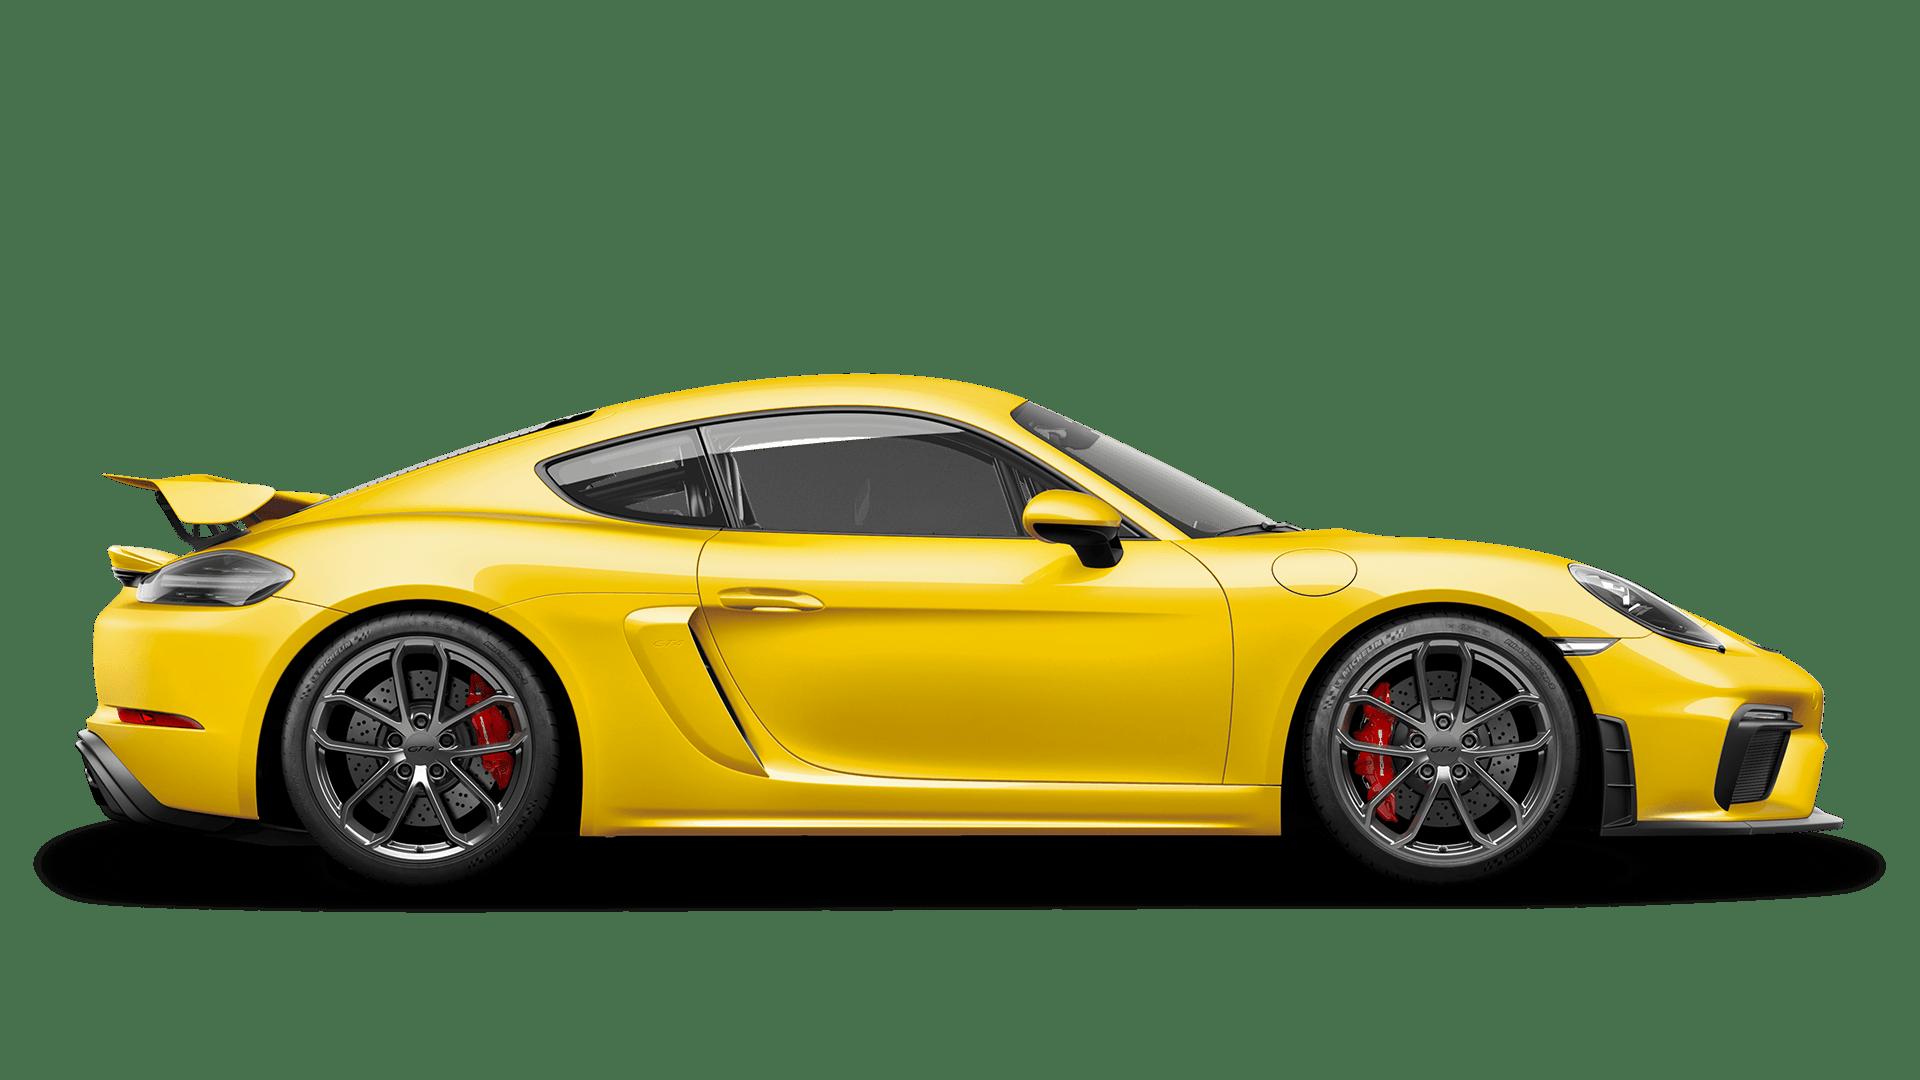 Modele 718 Cayman GT4